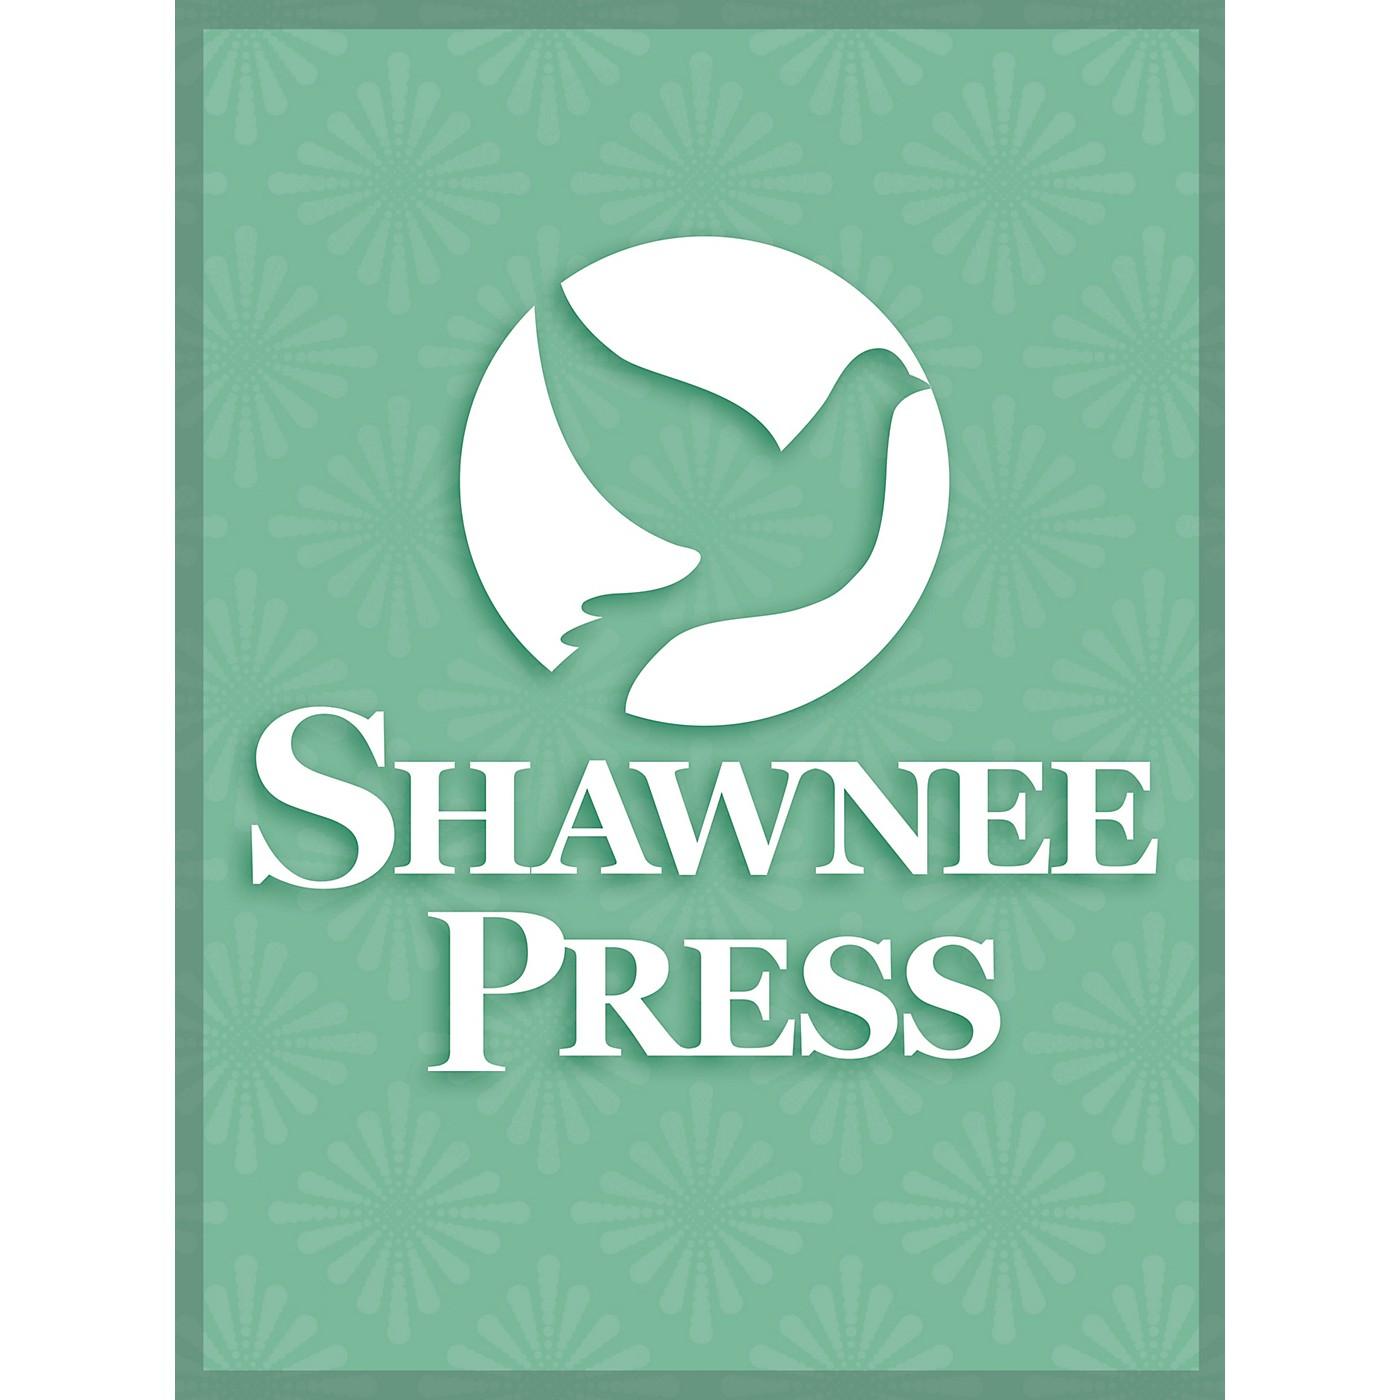 Shawnee Press Twenty One Christmas Carols for Woodwind Trio Shawnee Press Series Arranged by James thumbnail